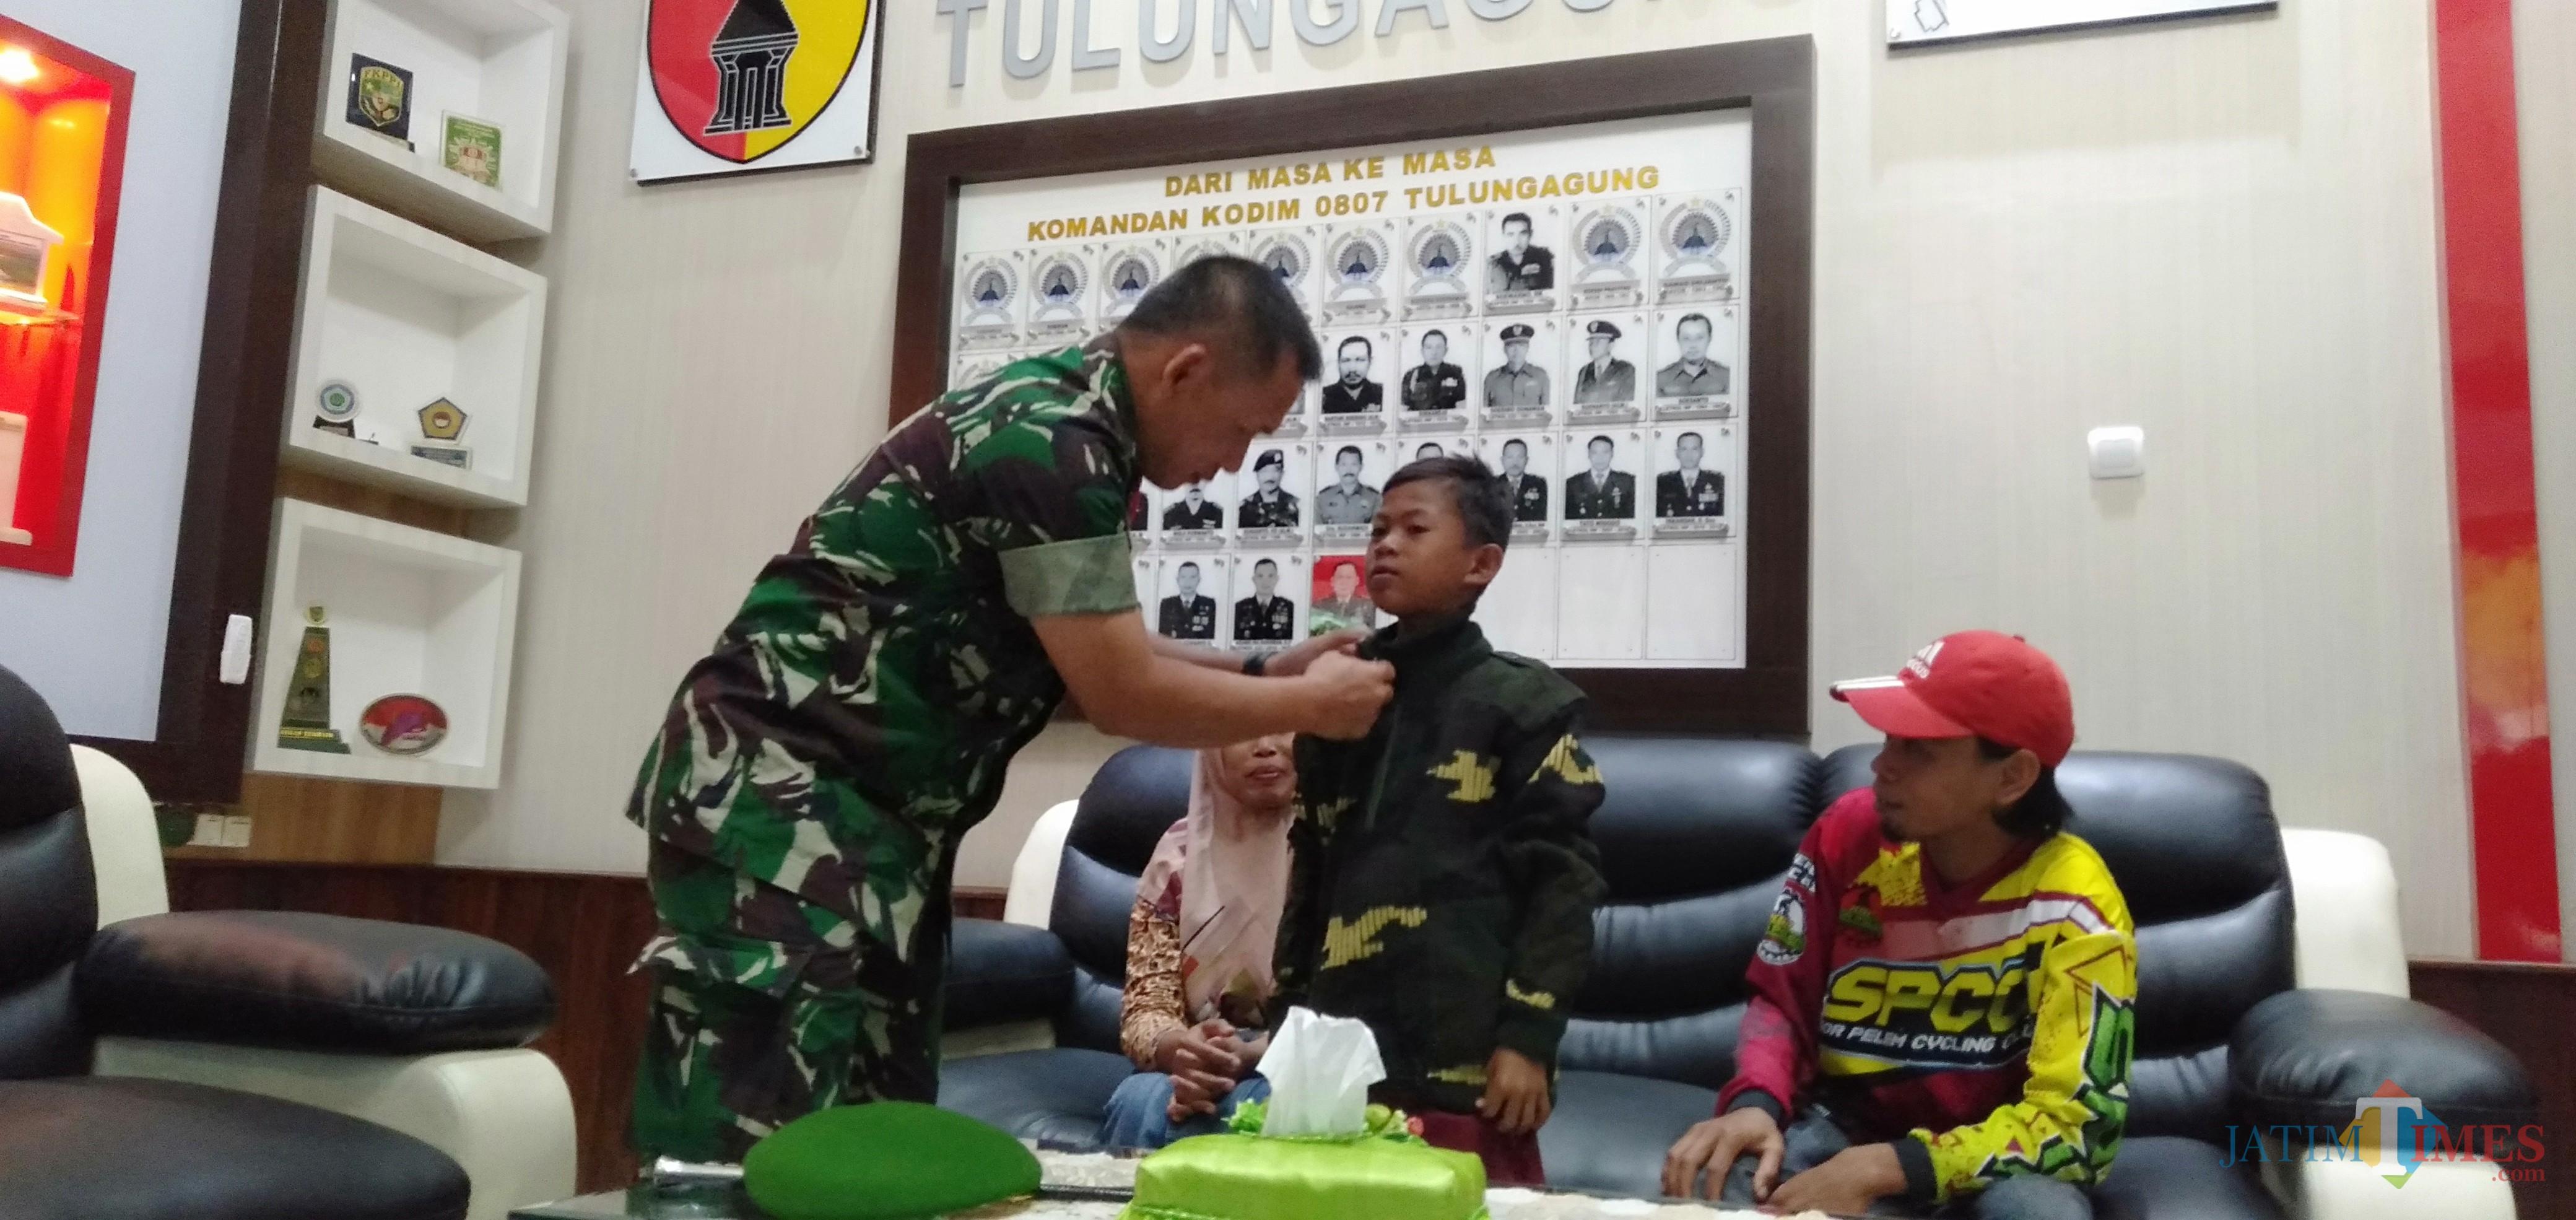 Komandan Kodim Tulungagung,  Letkol Wildan Bahtiar saat memakaikan jaket doreng pada Soni (foto: Joko Pramono/JatimTIMES)